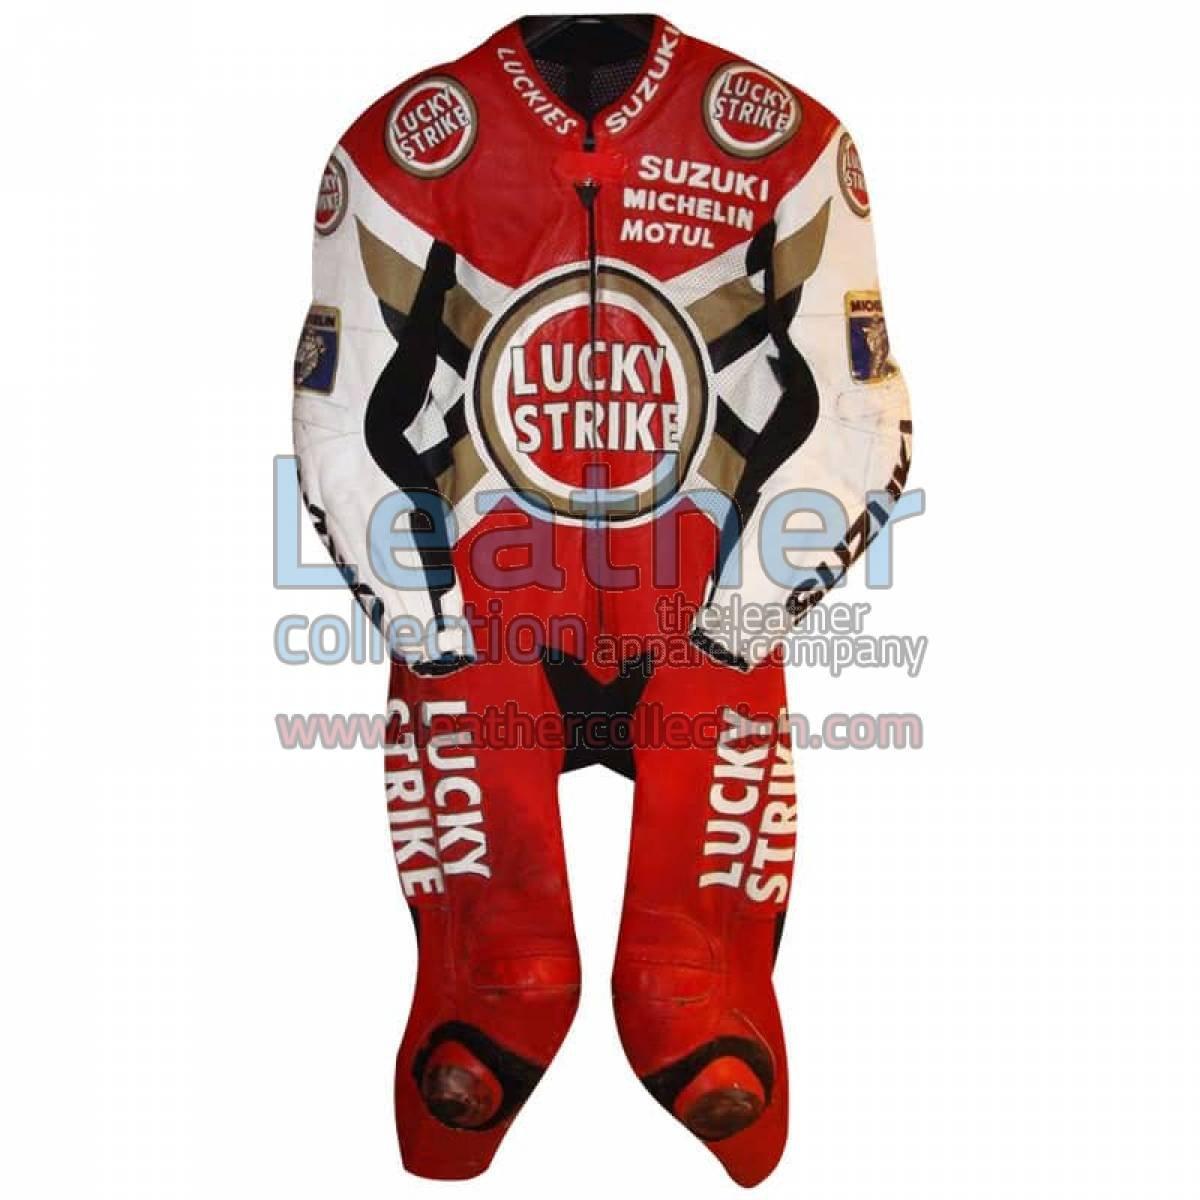 Anthony Gobert Suzuki Lucky Strike 1997 MotoGP Leathers